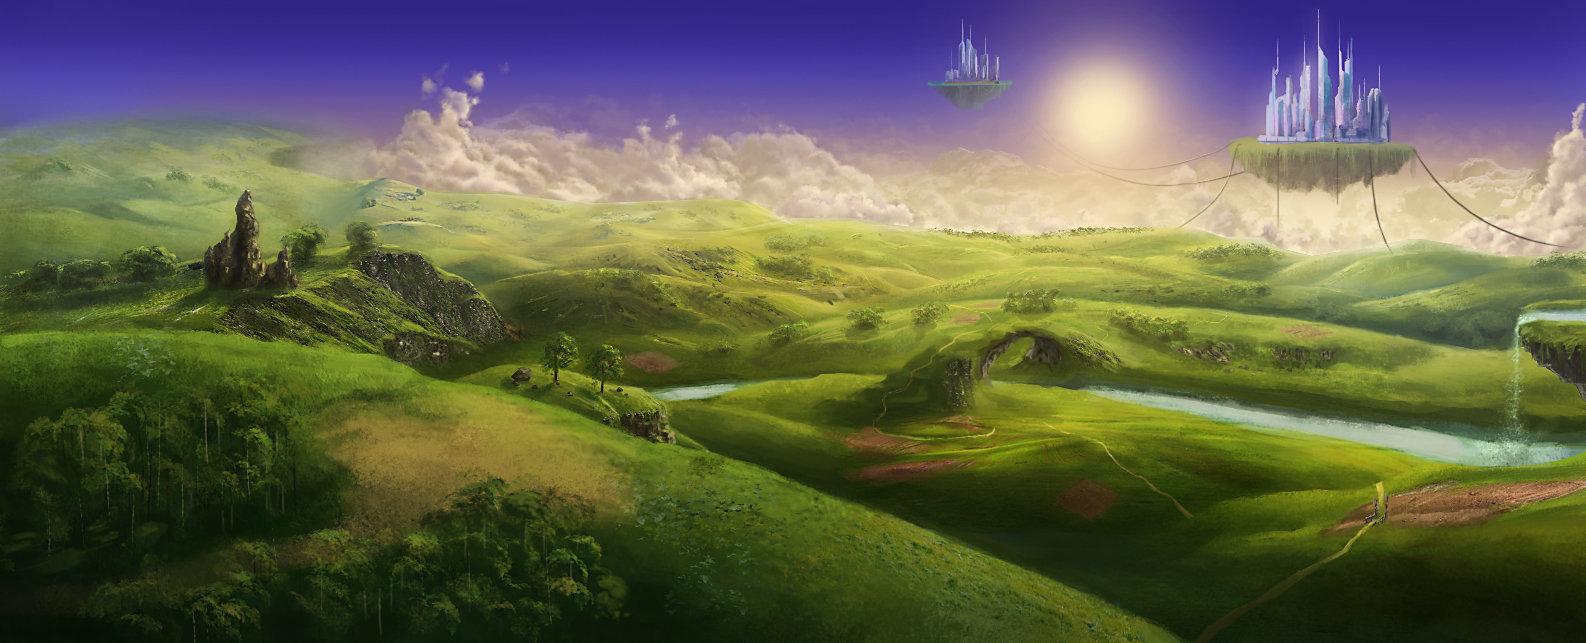 fantasy landscapelac-tic on deviantart